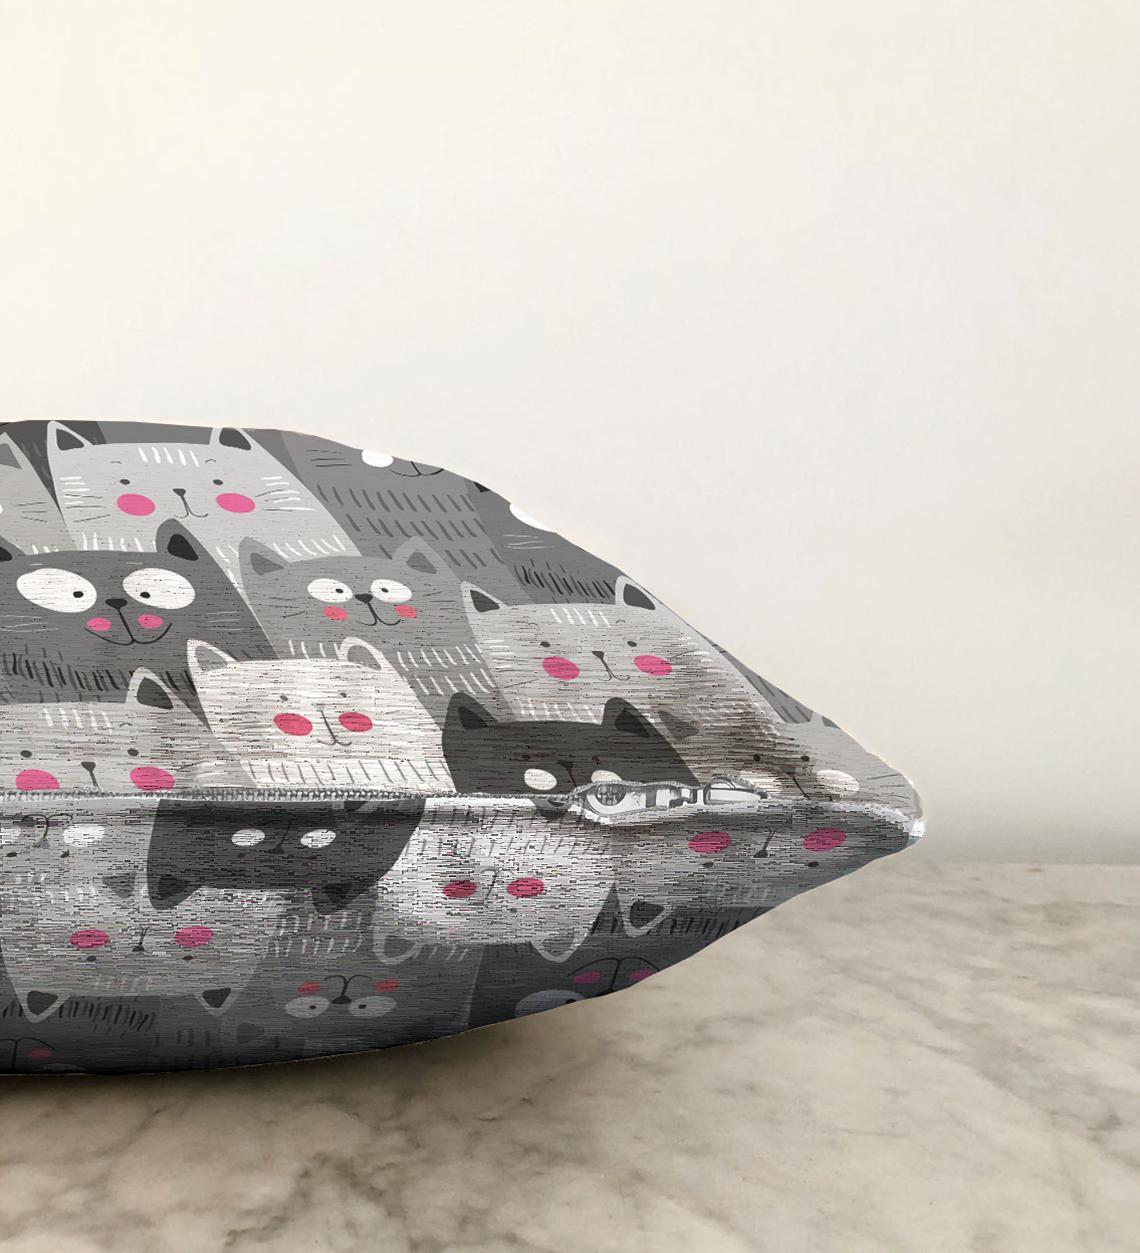 Realhomes Çift Taraflı Dijital Baskılı Şönil Yastık Kırlent Kılıfı - 55 x 55 cm Realhomes